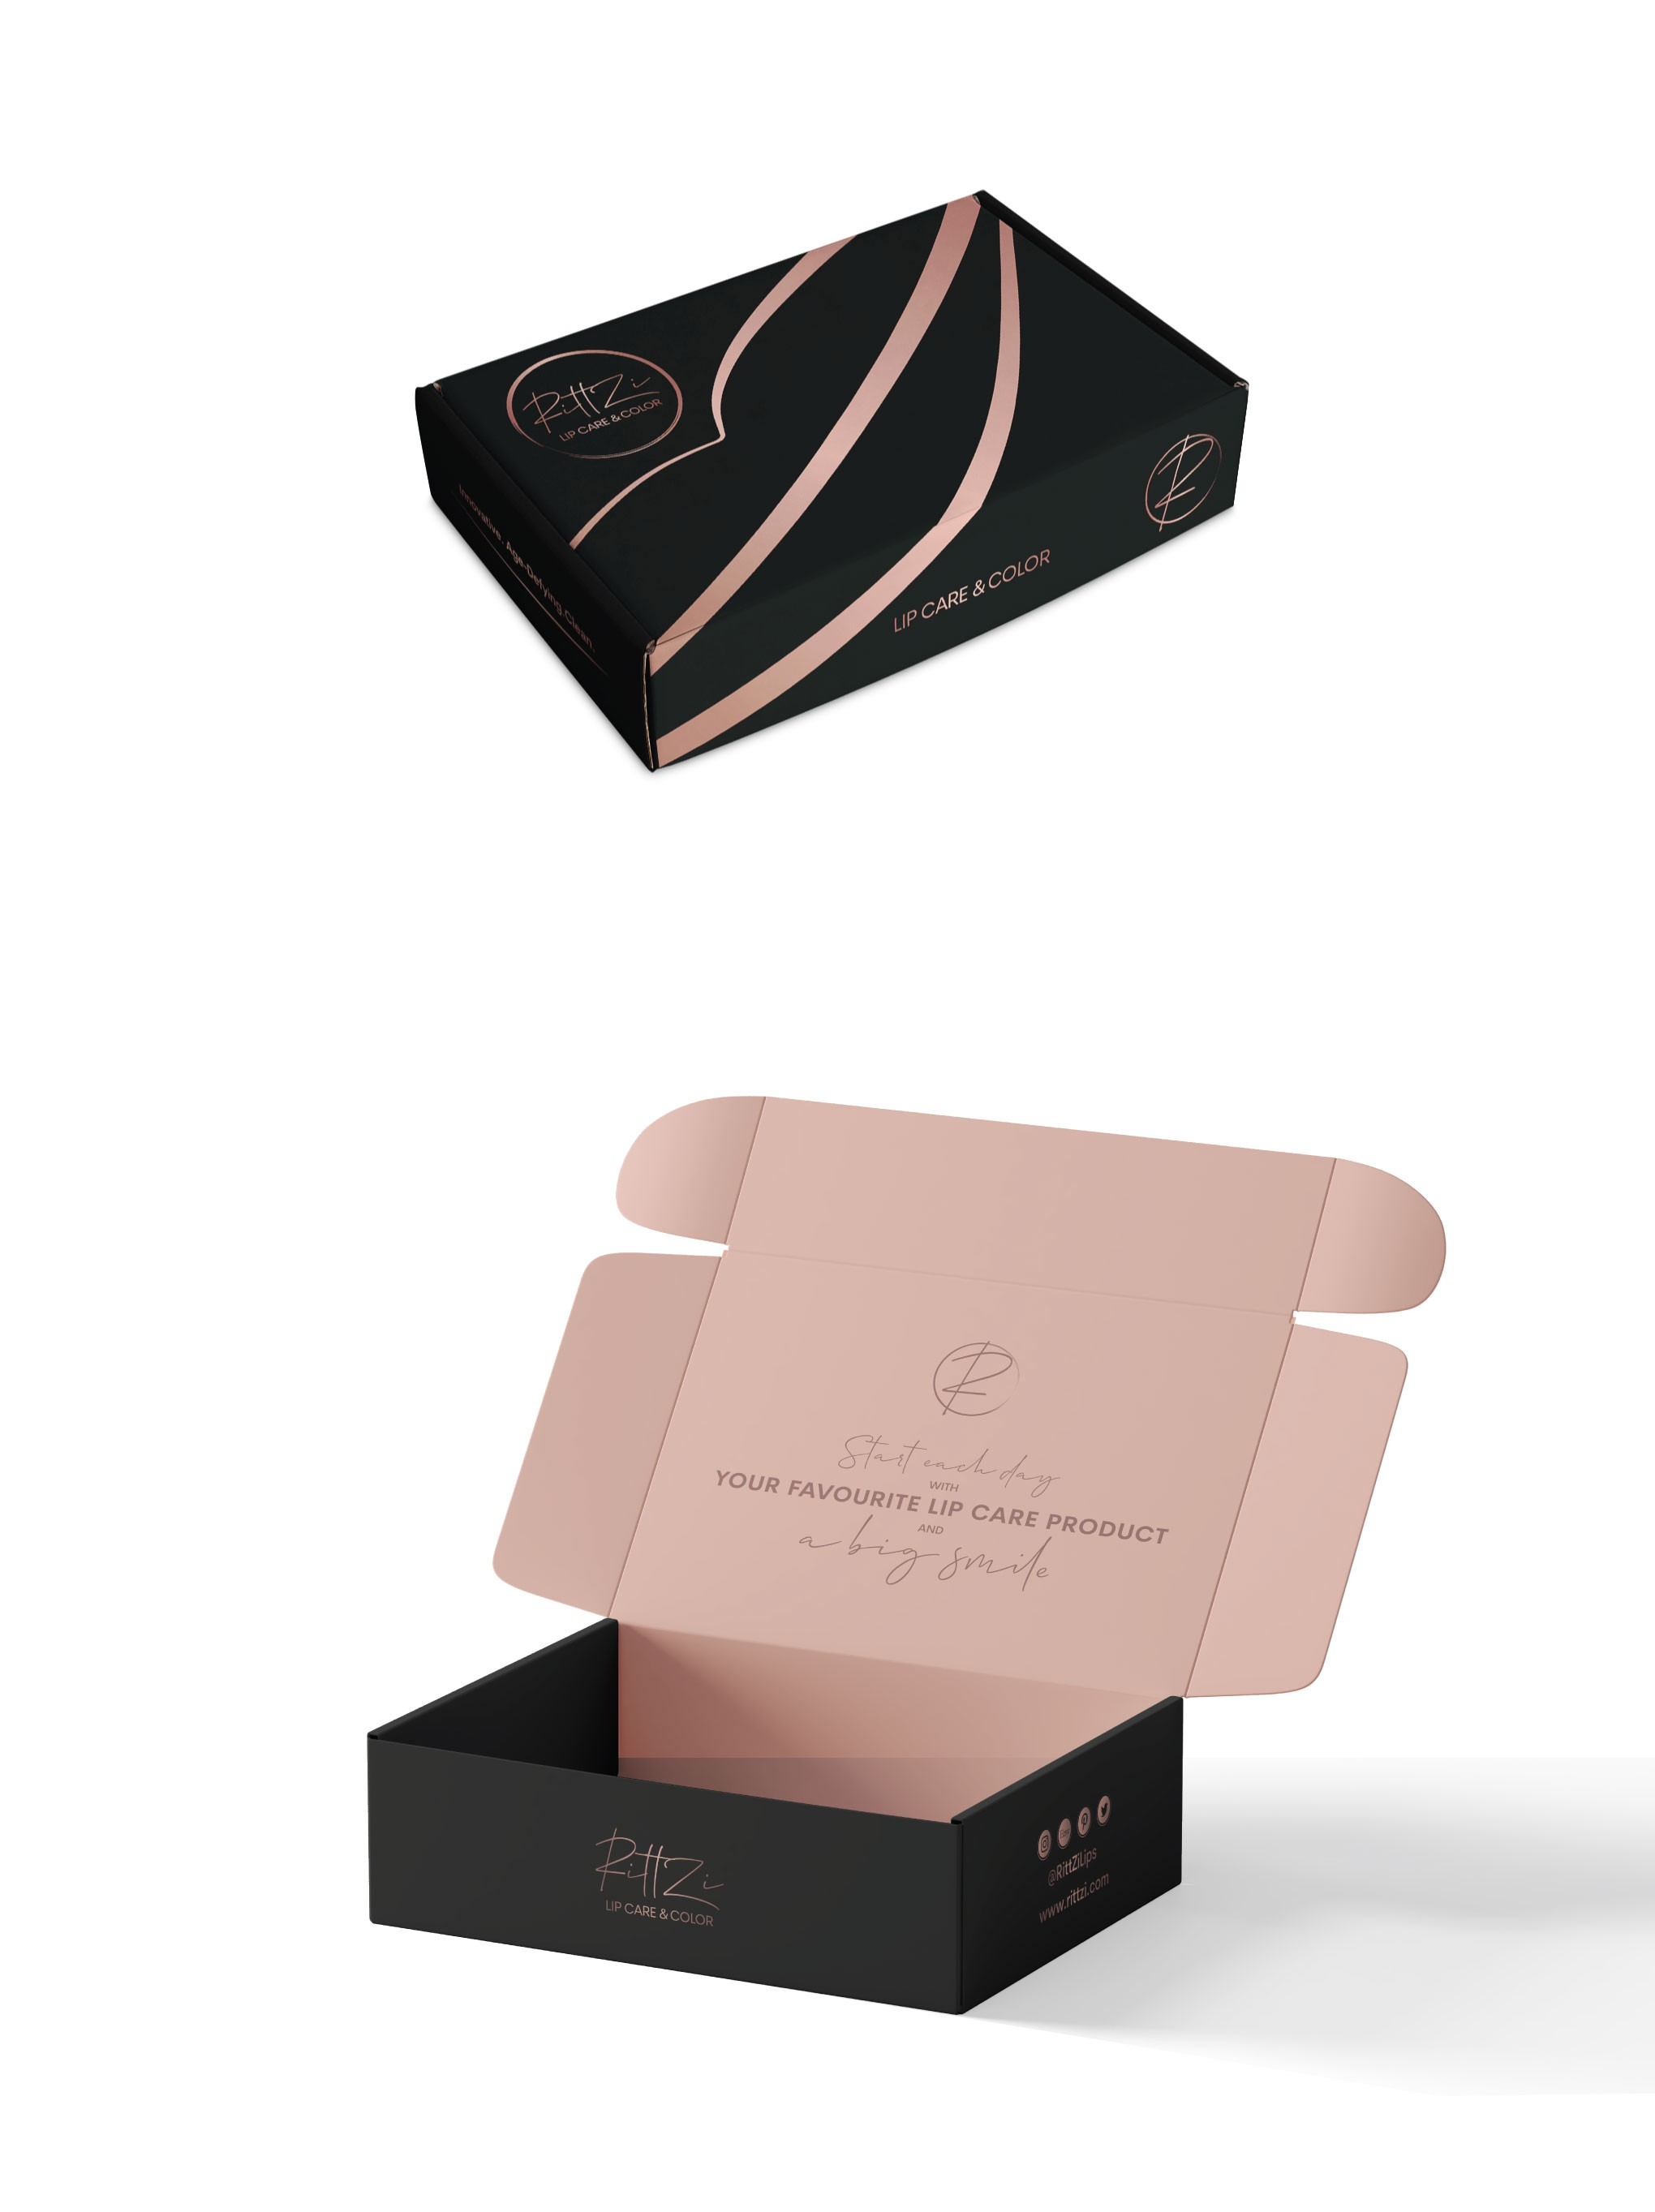 Design Mailer Box for New Beauty Brand